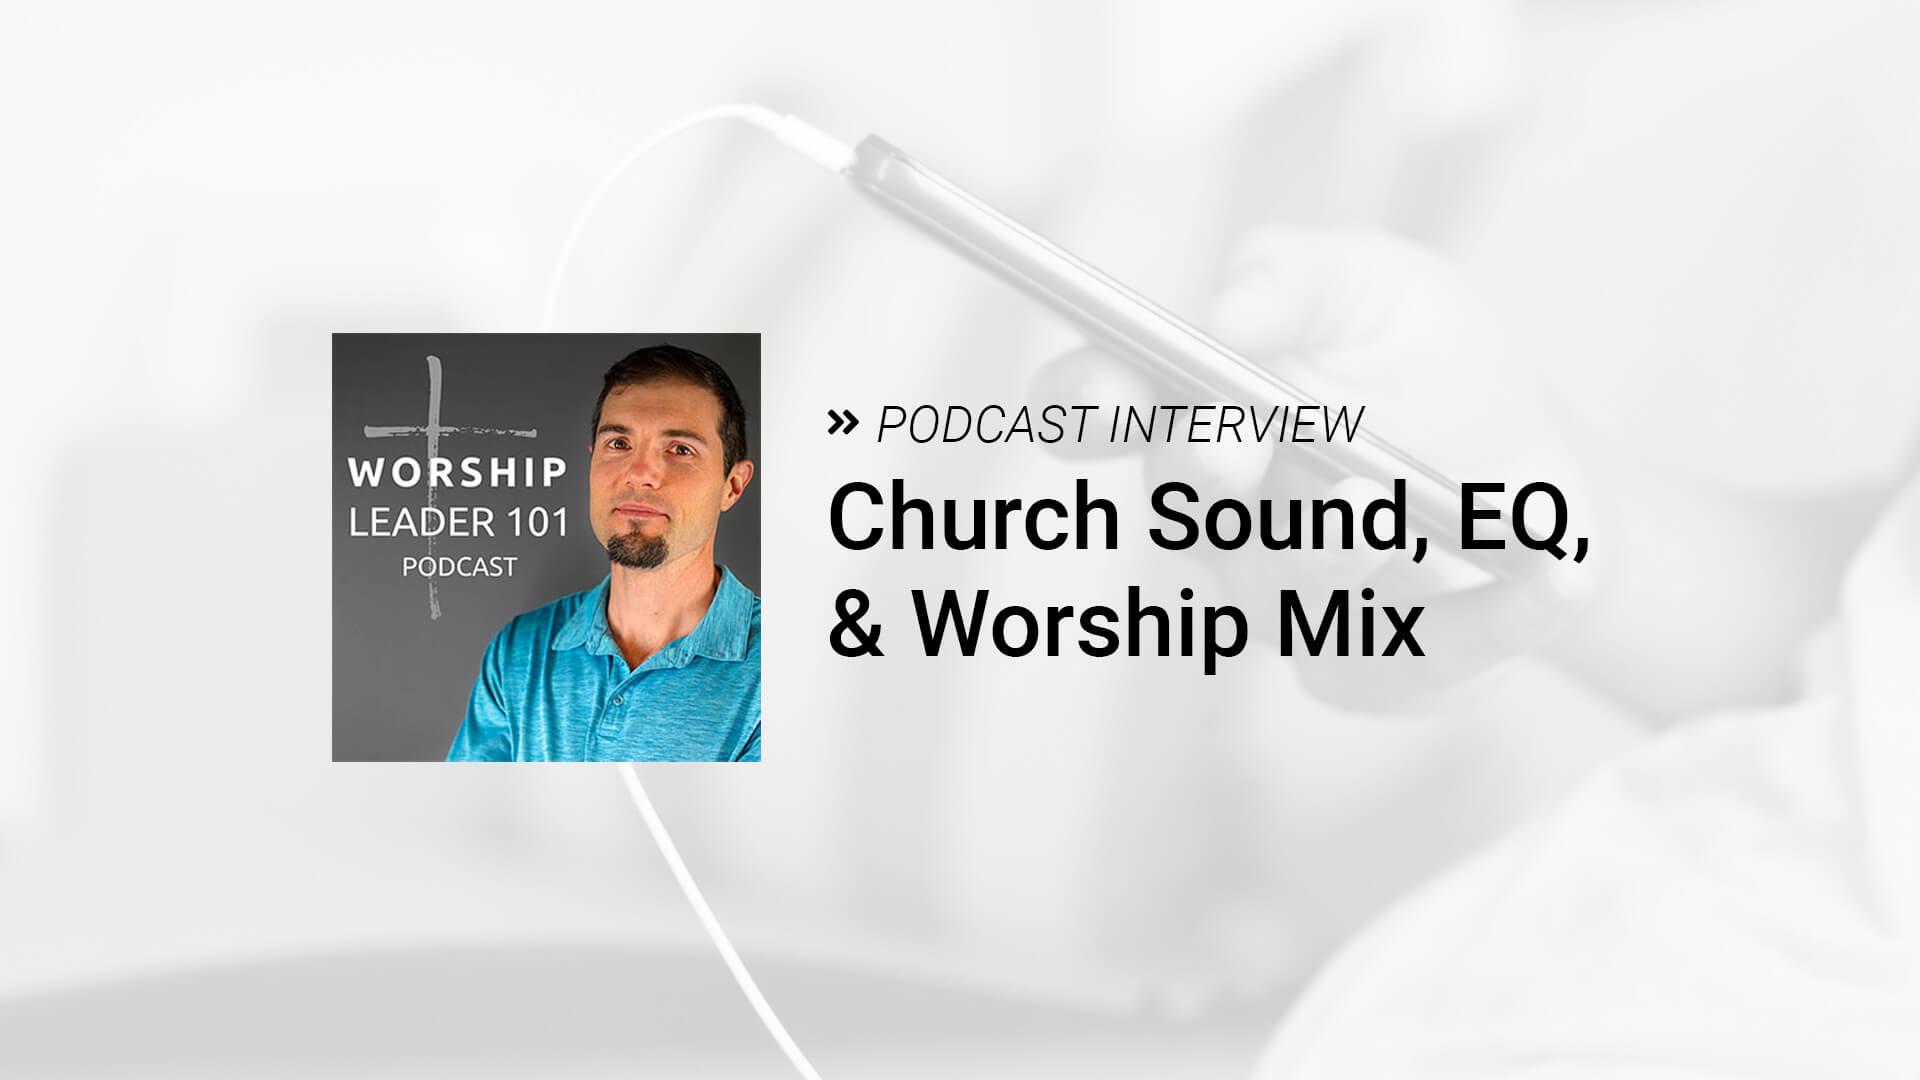 Church Sound, EQ, & Worship Mix [Podcast]